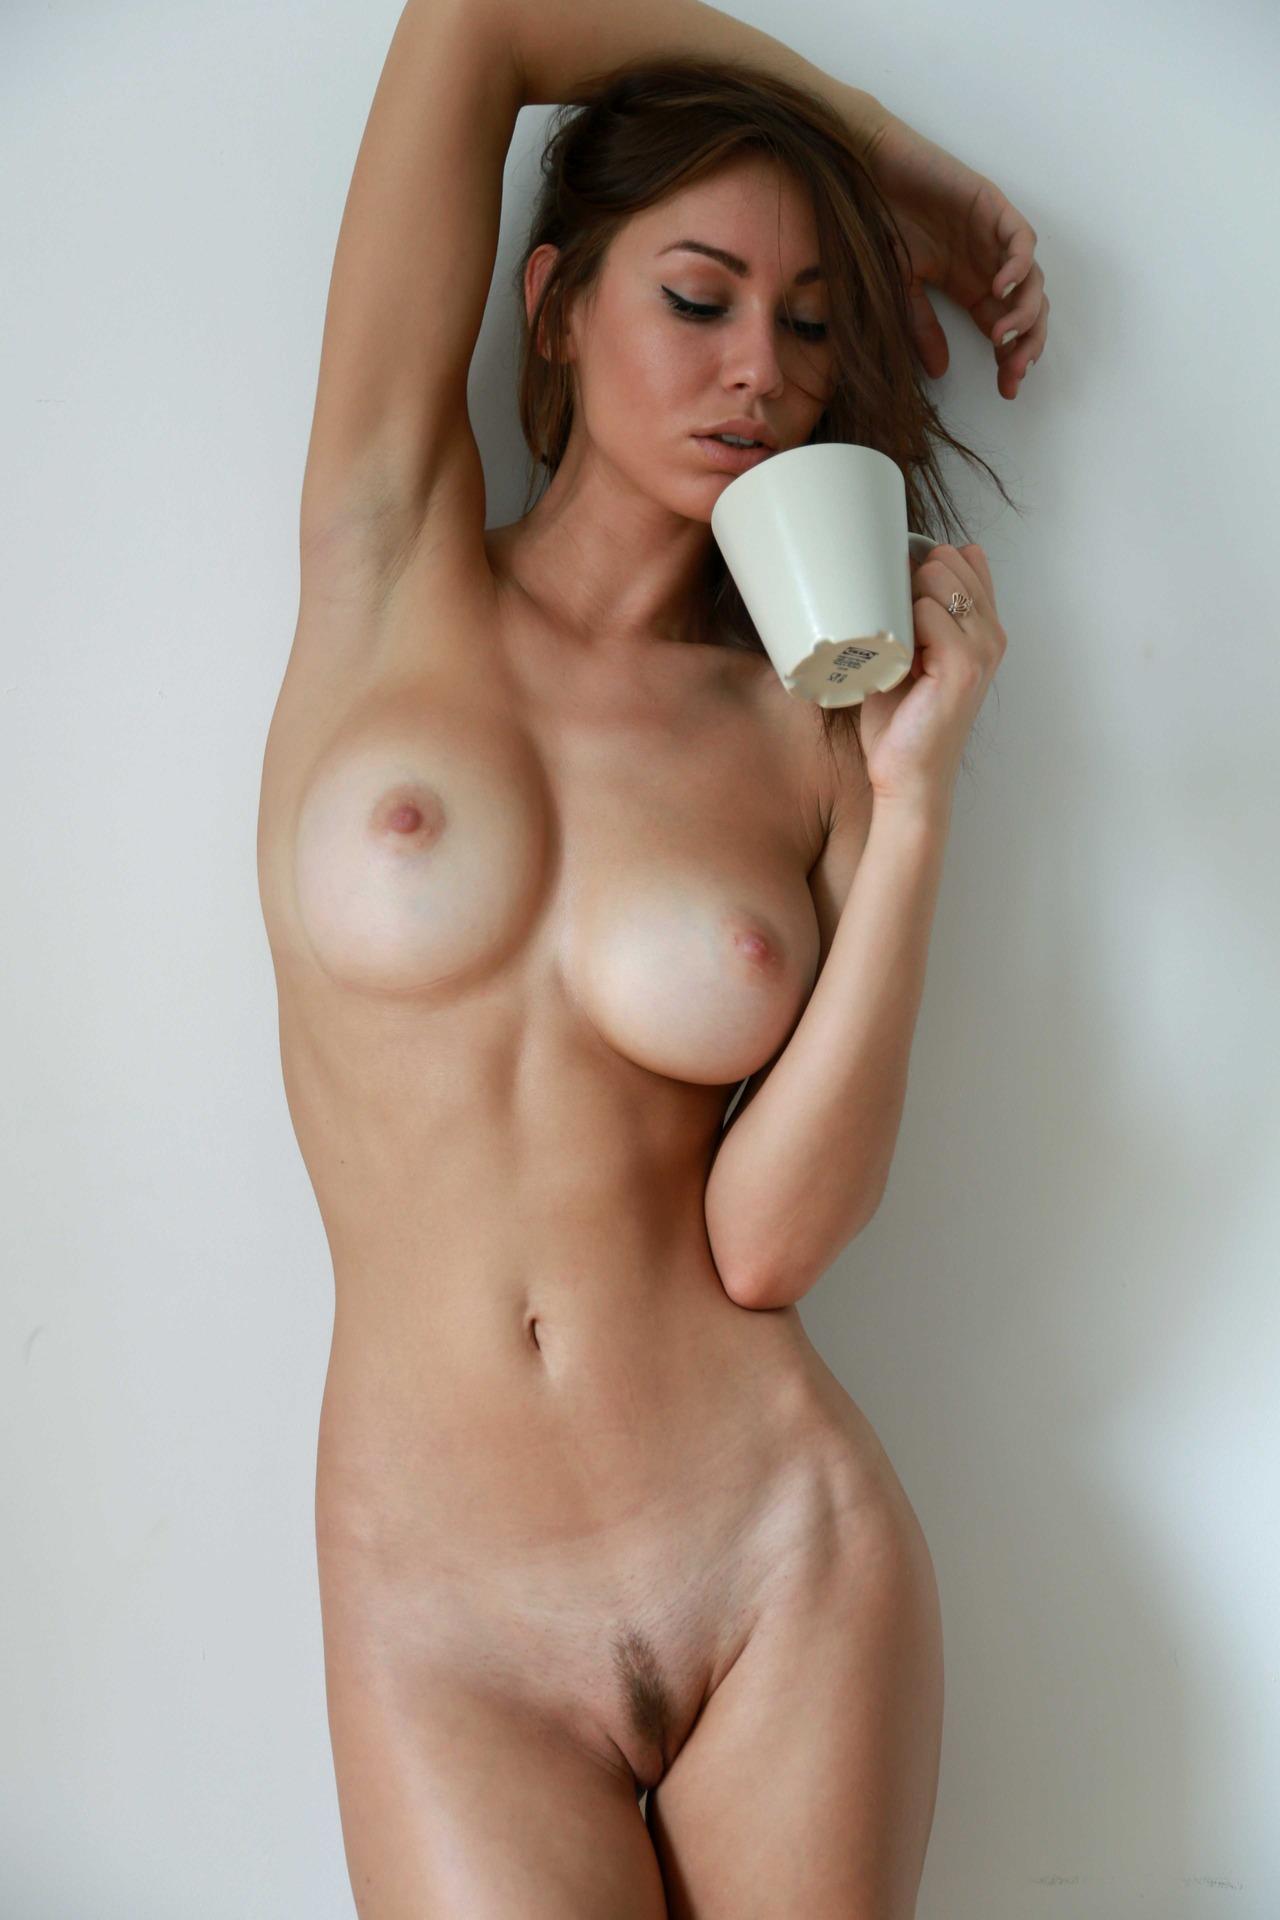 Most Beautiful Woman Nude 78